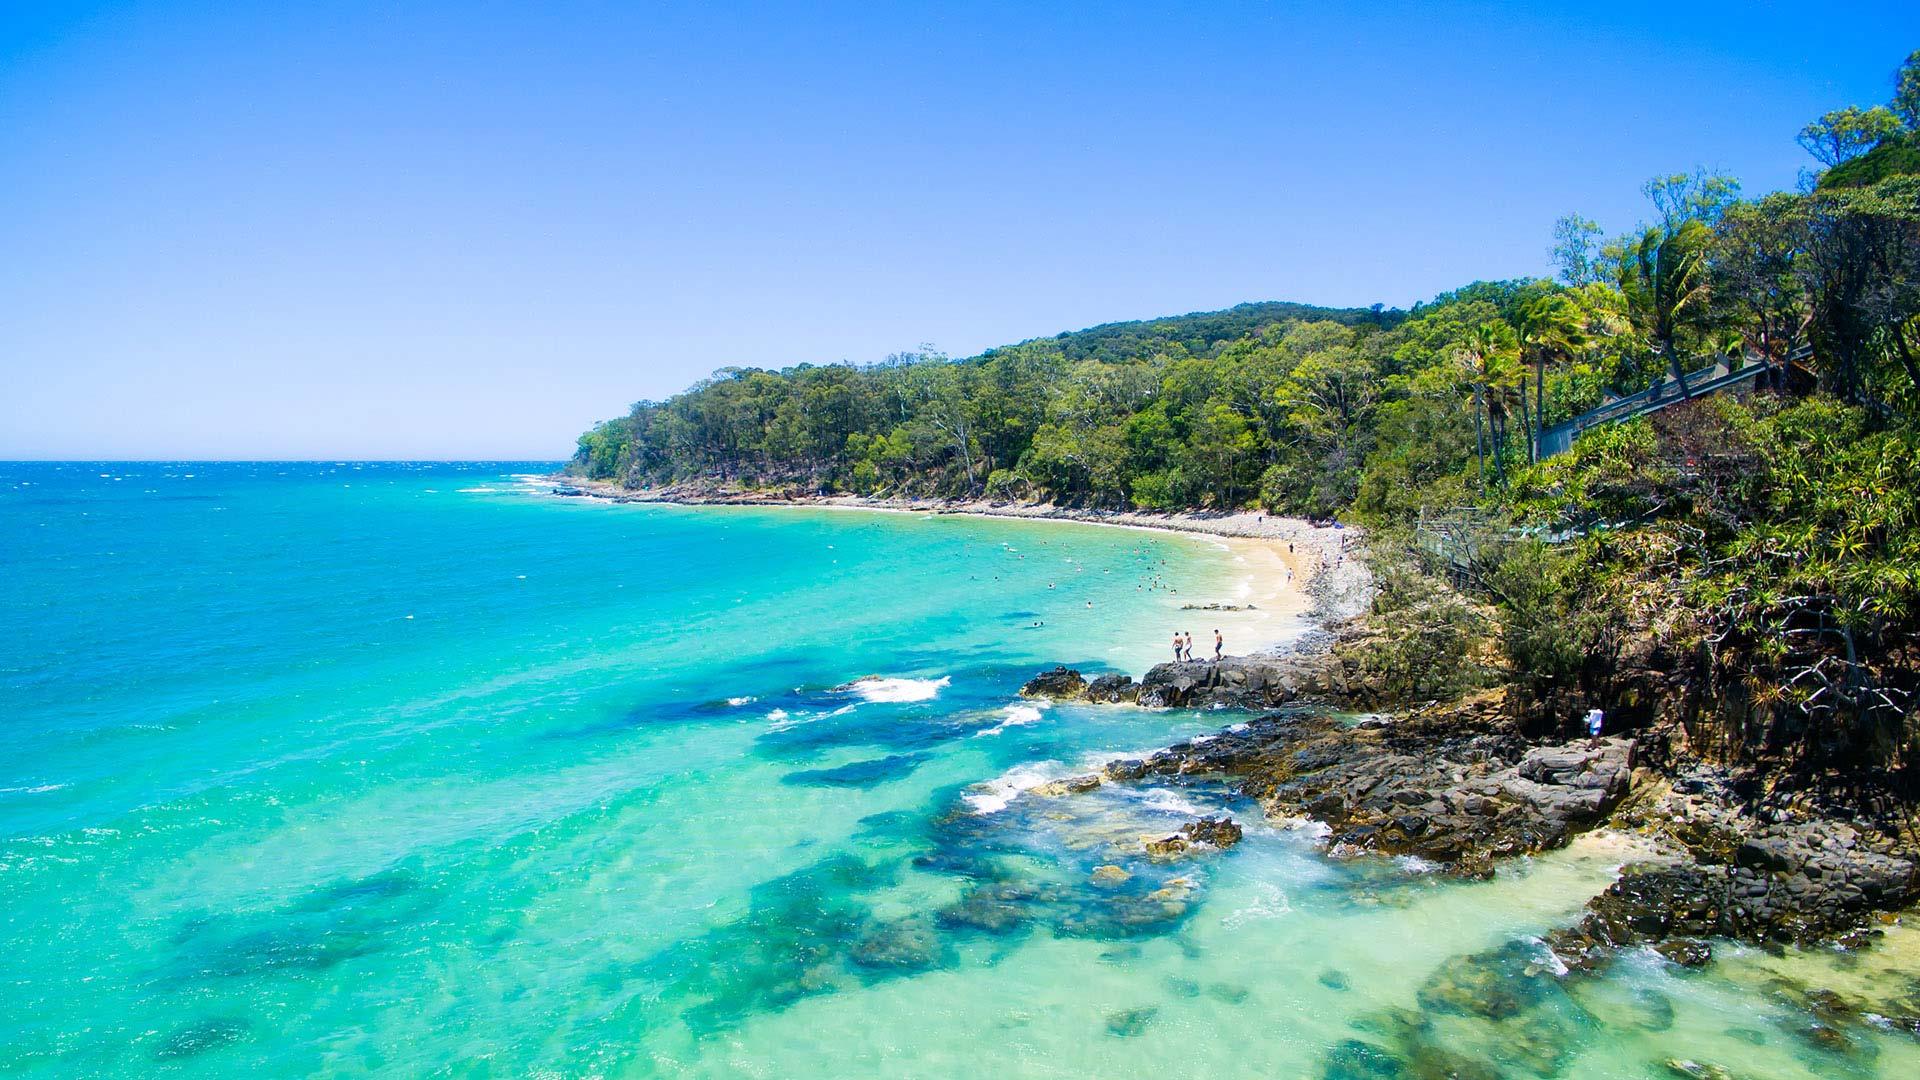 Panorama to illustrate dating in sunshine coast